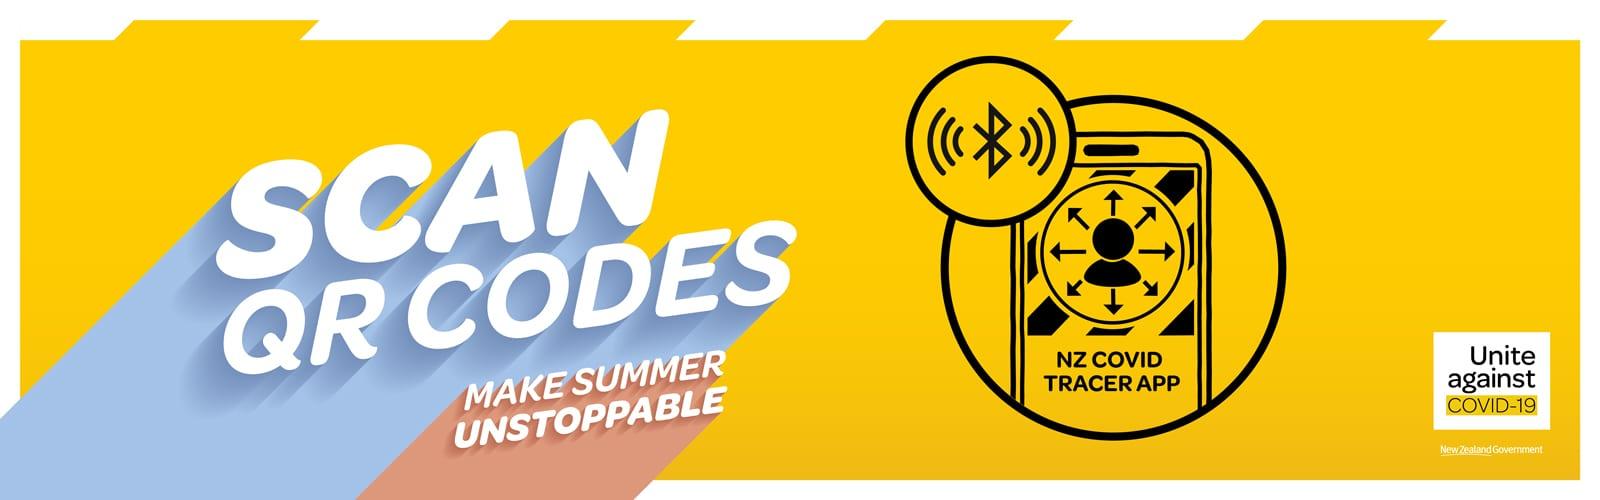 COVID 19 Make Summer Unstoppable Digital Banner Scan QR Codes